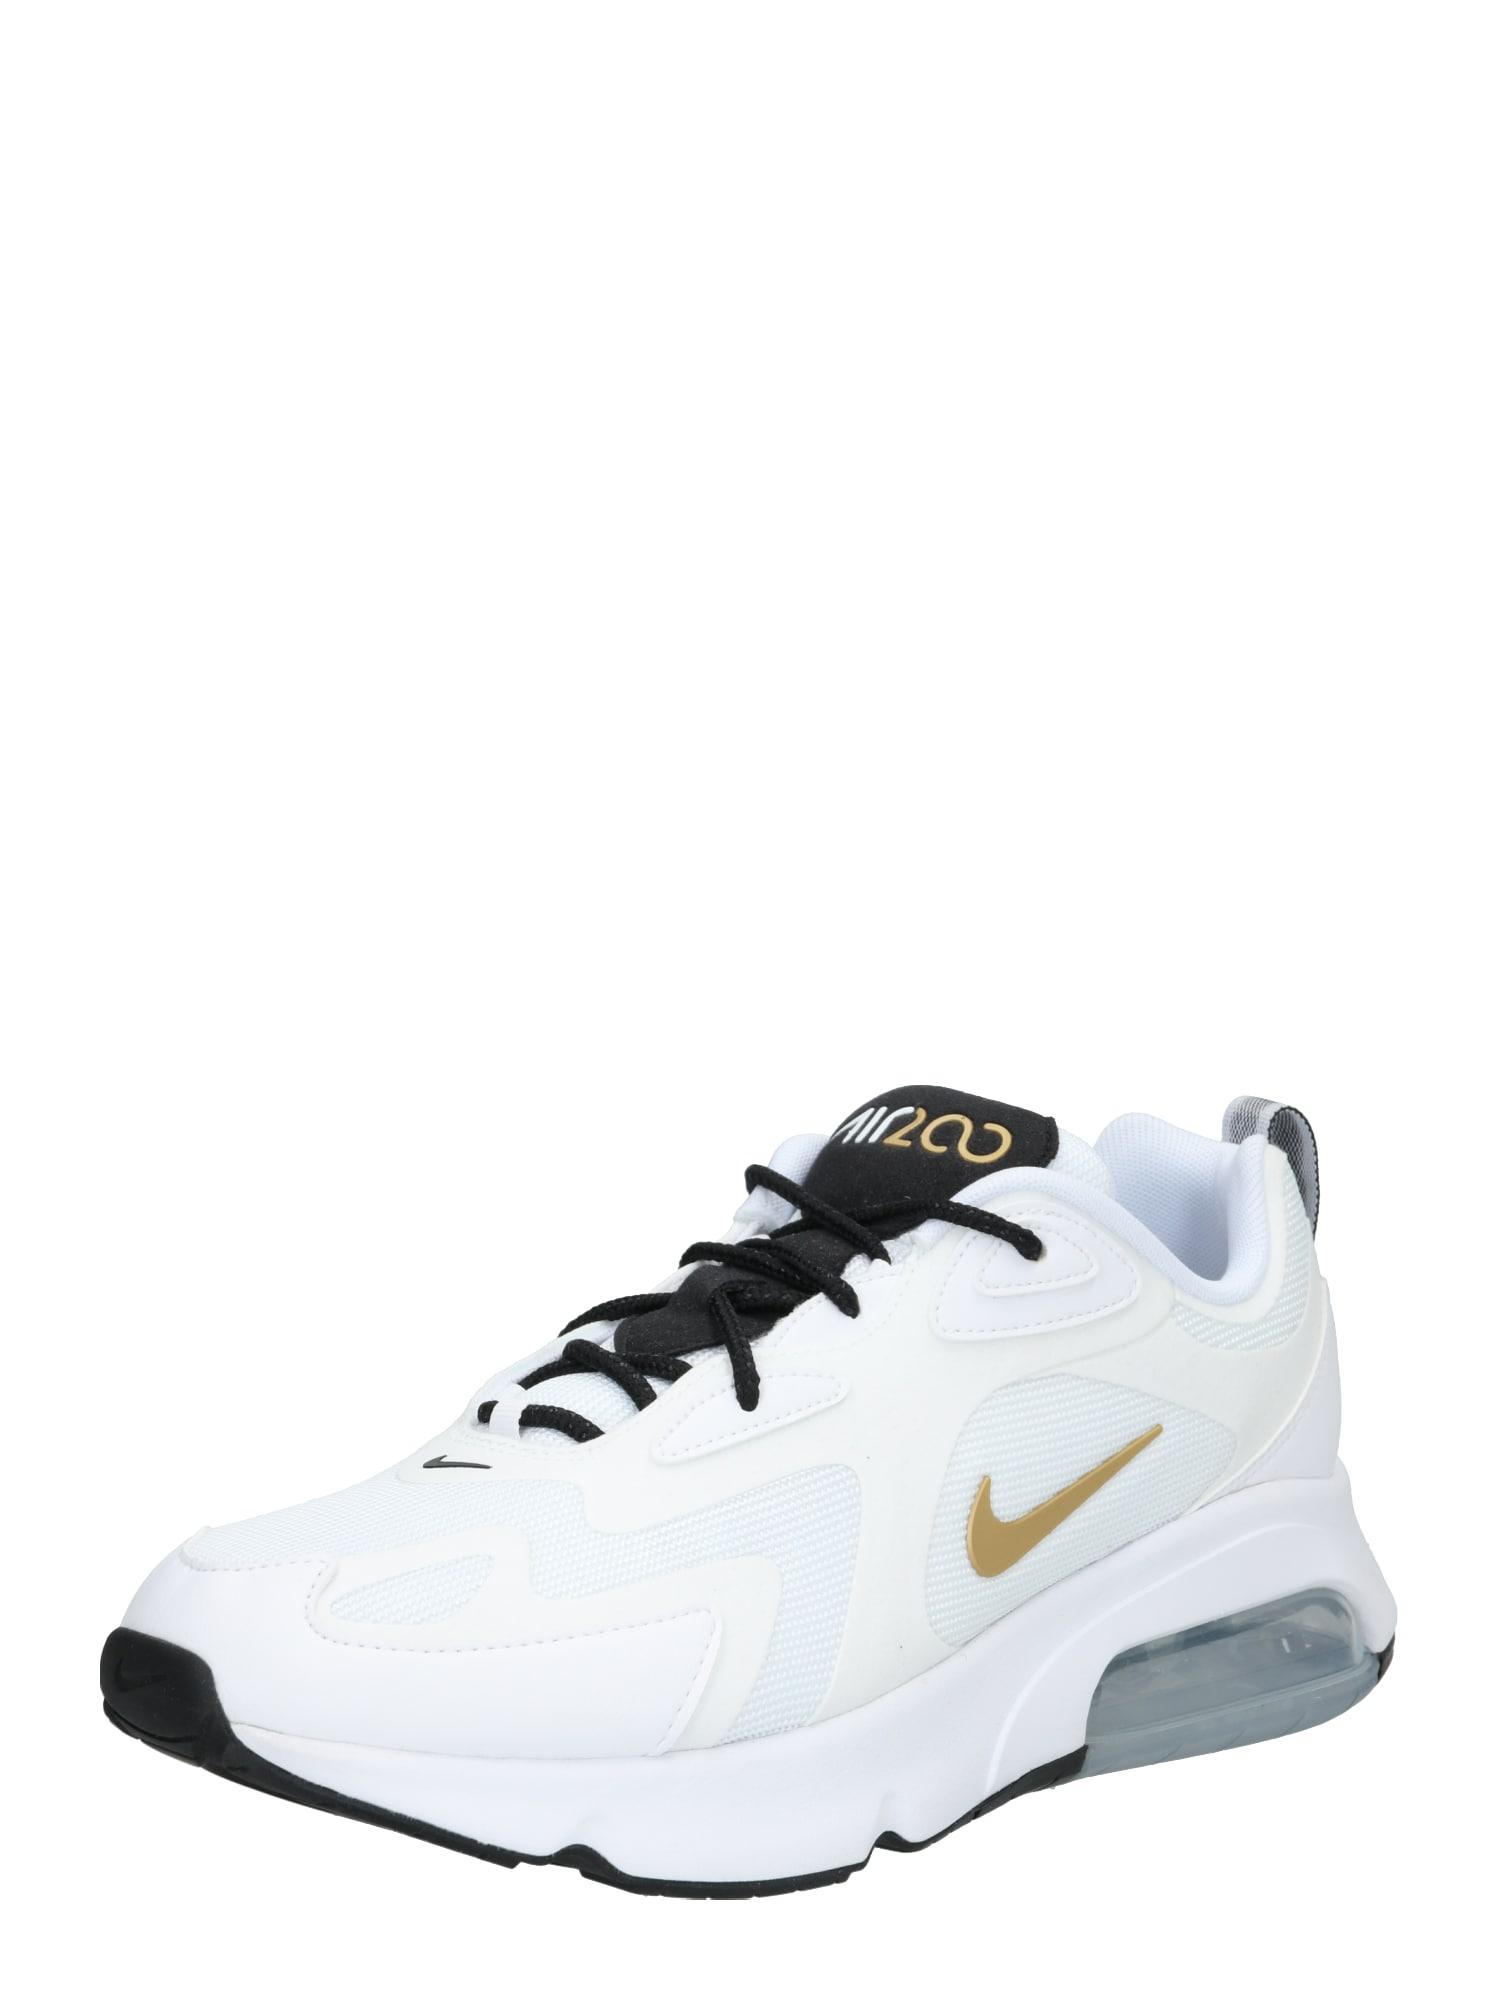 Tenisky AIR MAX 200 zlatá bílá Nike Sportswear